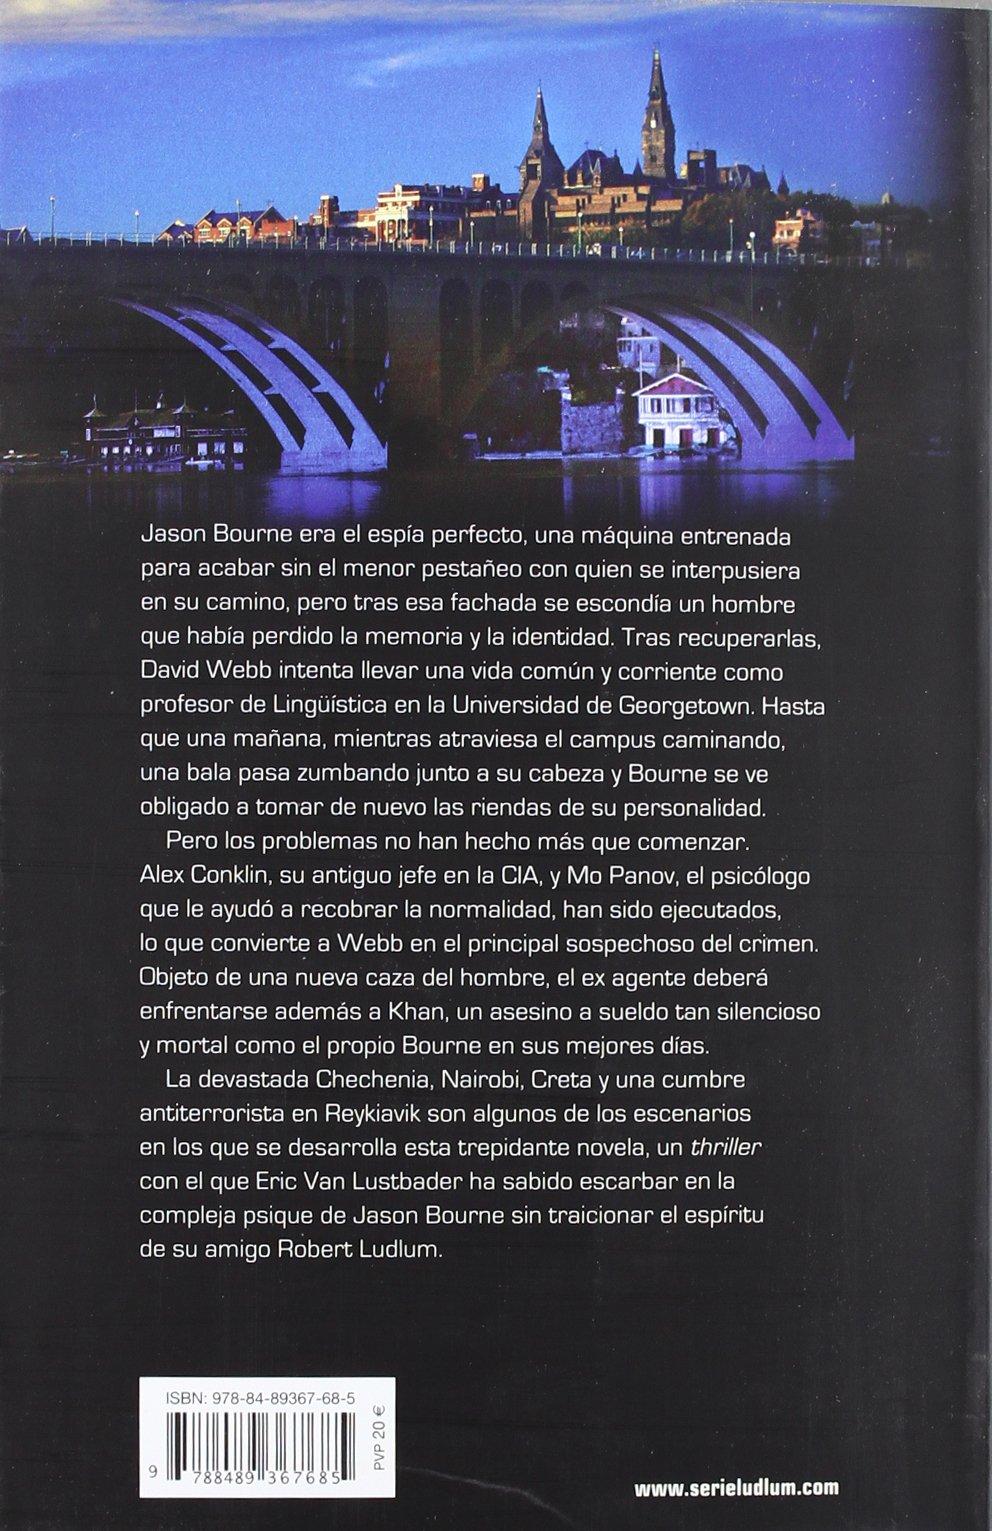 El legado de Bourne (Umbriel thriller): Amazon.es: Eric Van ...